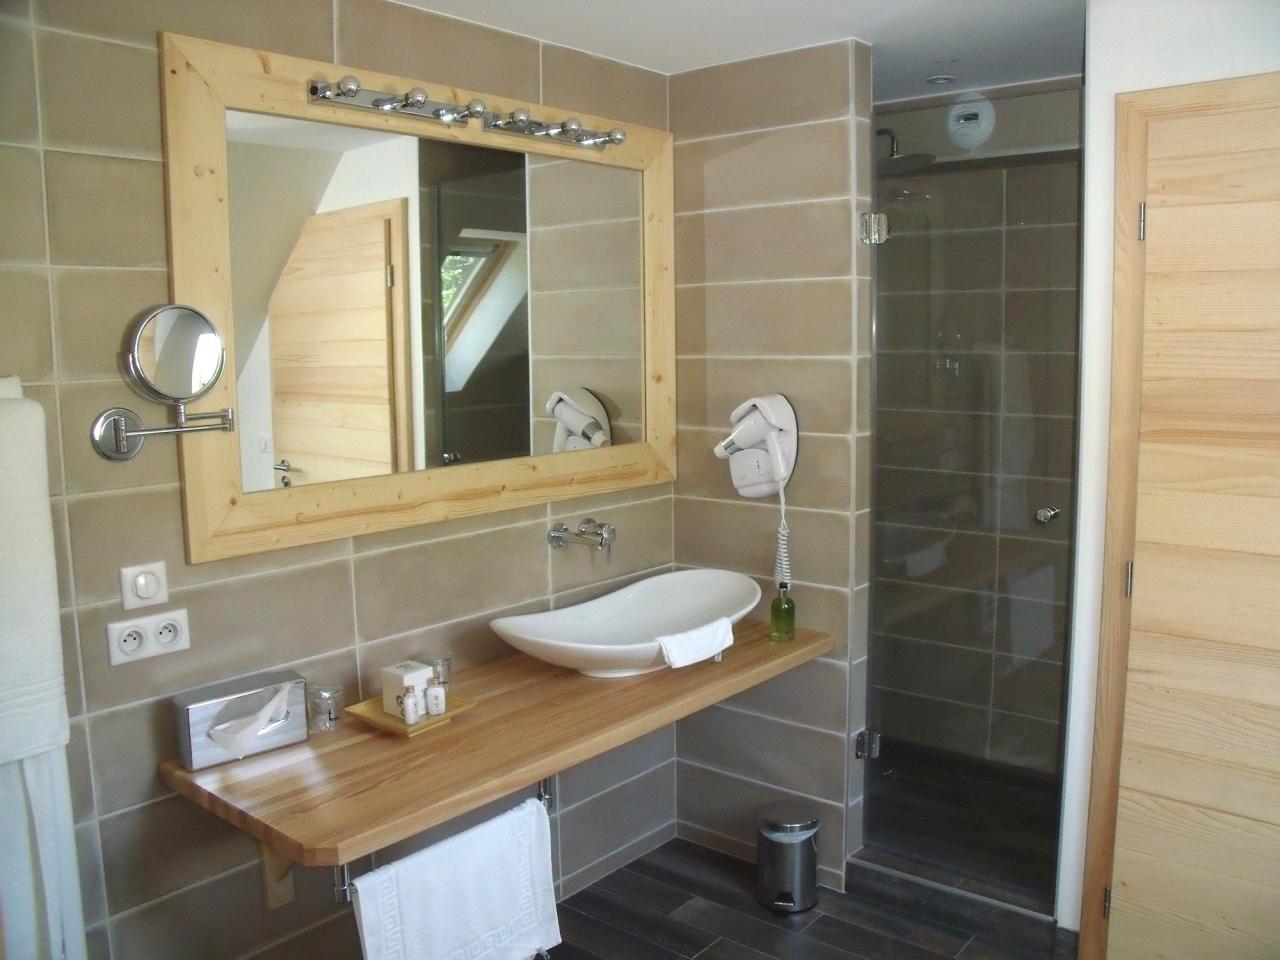 Salle de bain et miroir